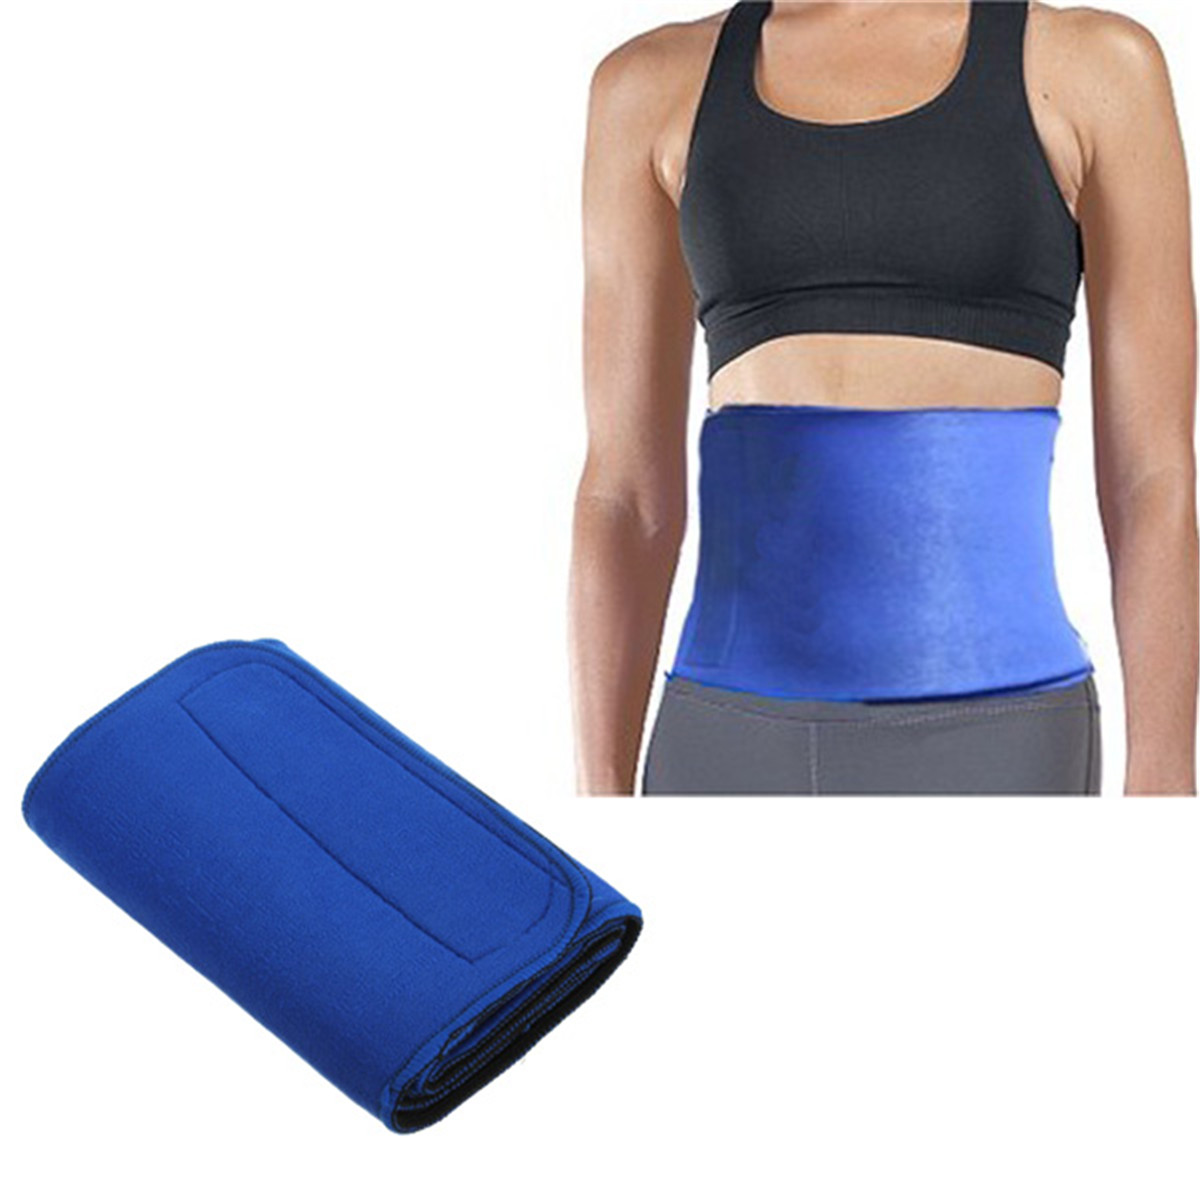 Slimming Waist Belt Wrap Body Fitness Fat Cellulite Burner ...